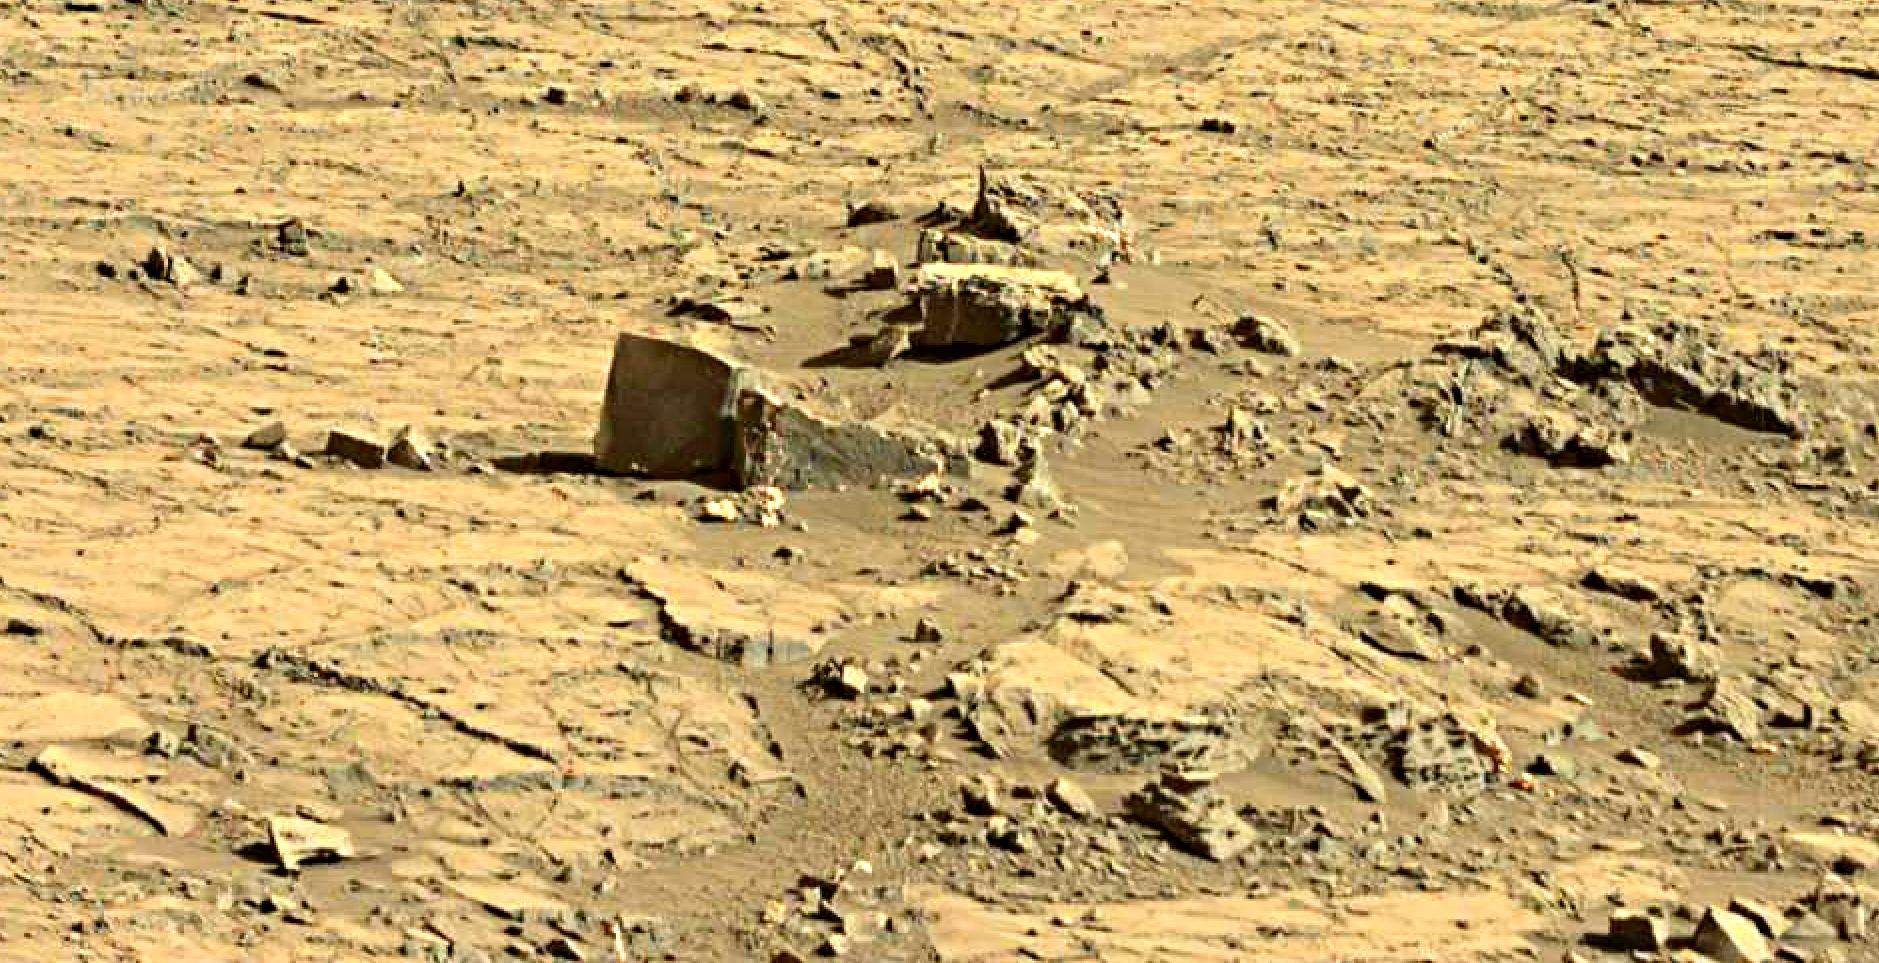 Mars Sol 1267 Curiosity – 1267ML0059330000504321E01   Was ...